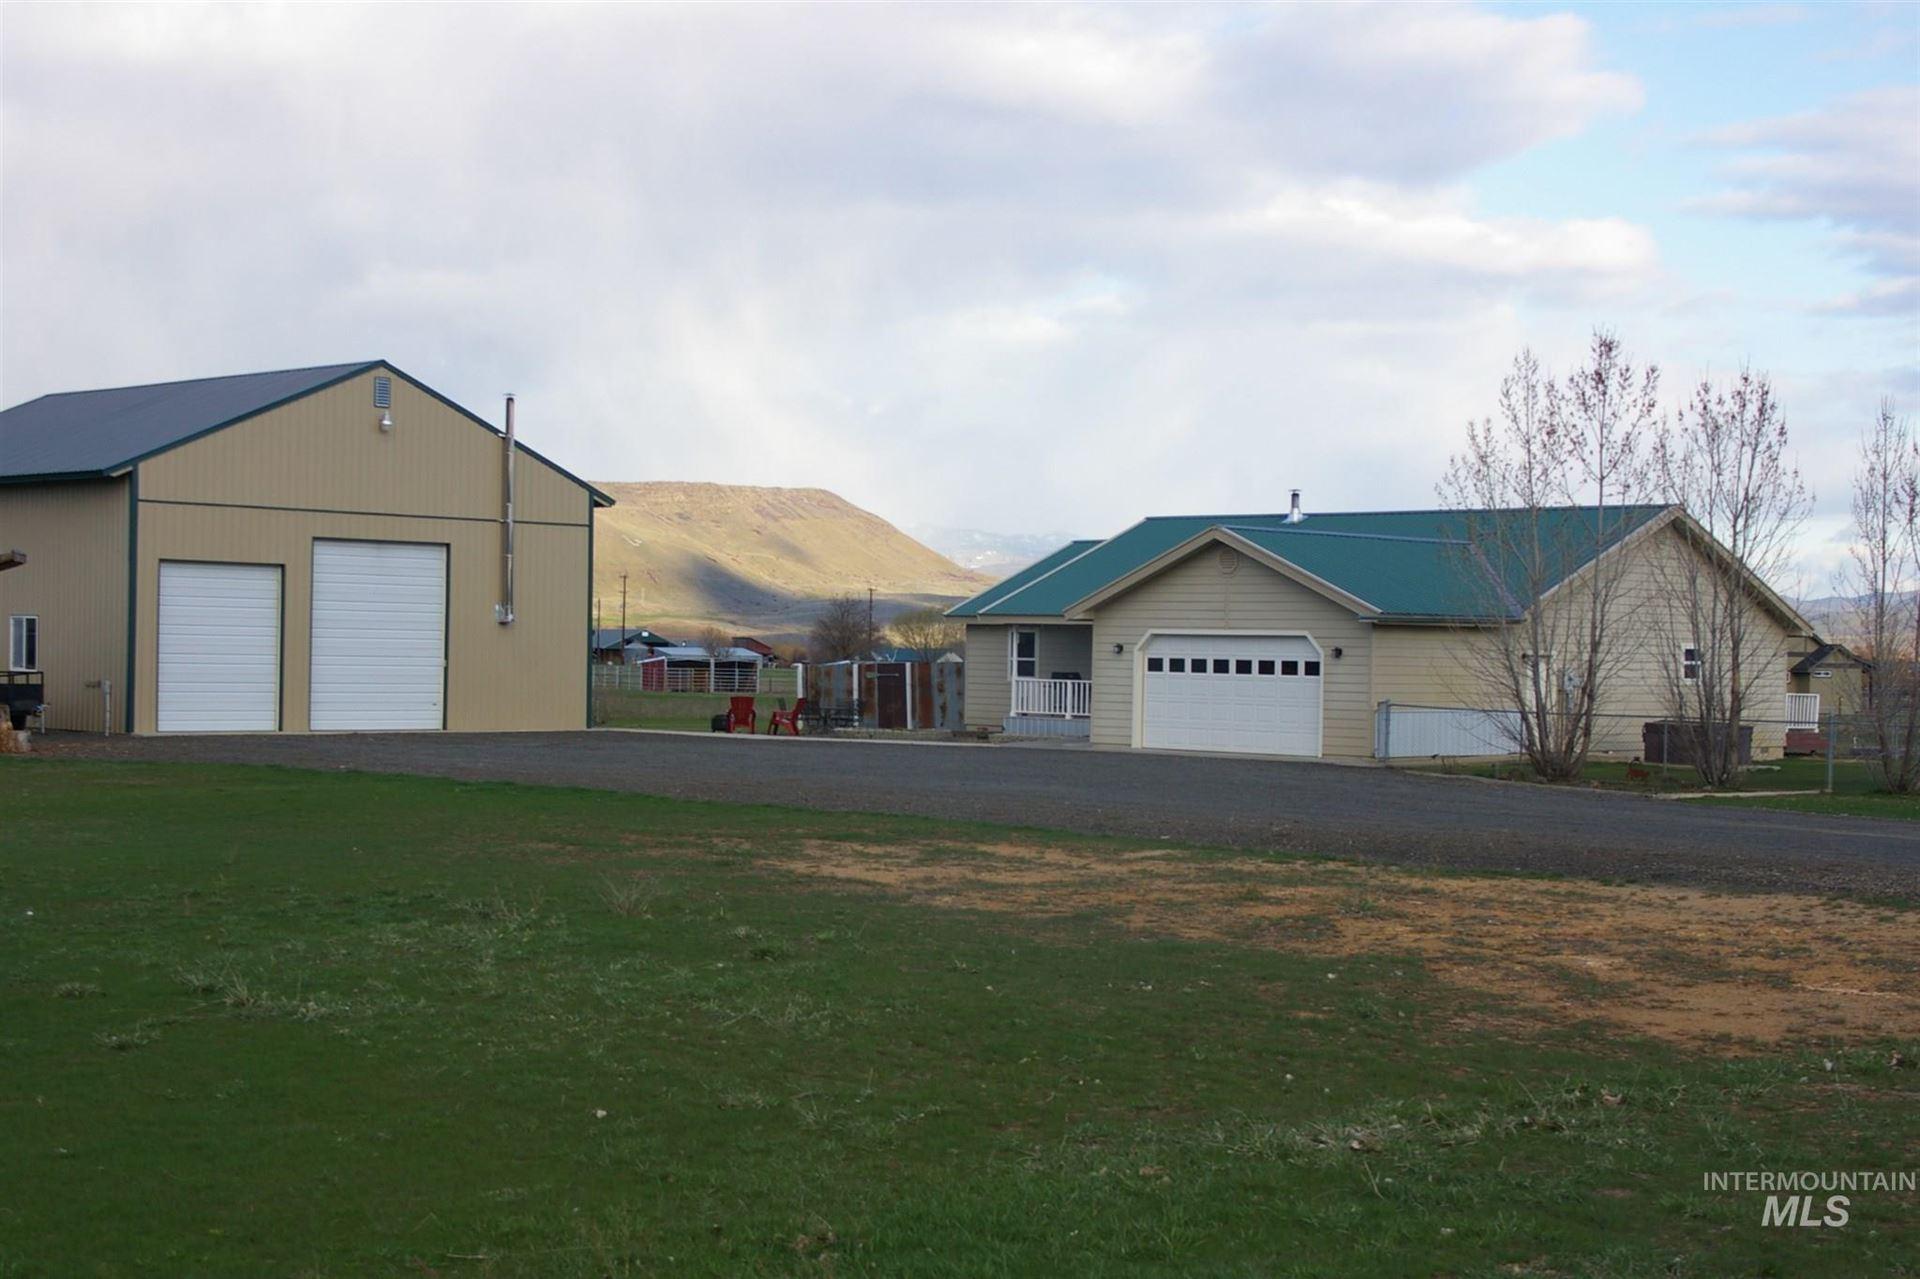 Photo of 2681 Painted Ridge LN, Cambridge, ID 83610 (MLS # 98798915)